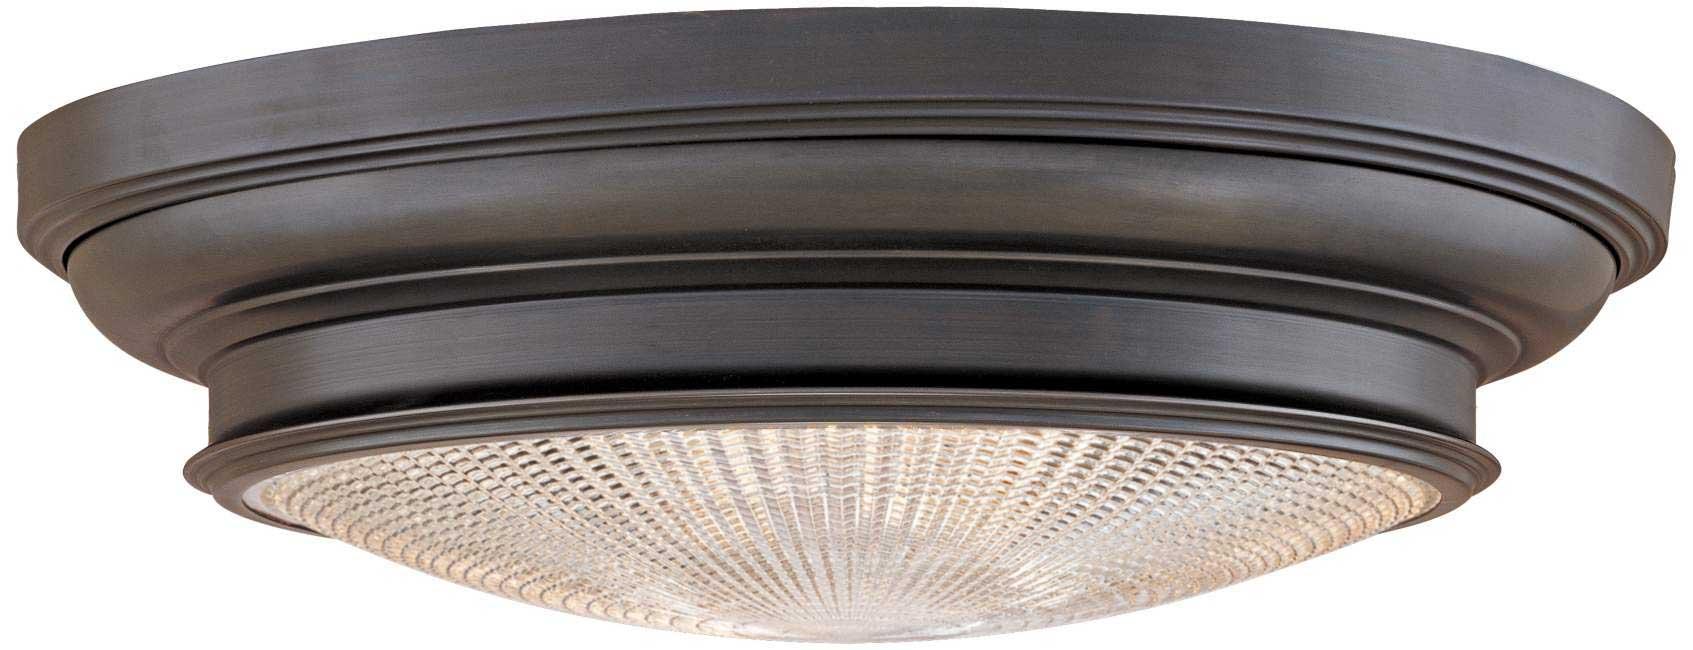 Lighting Luxury Style Woodstock Ceiling Light